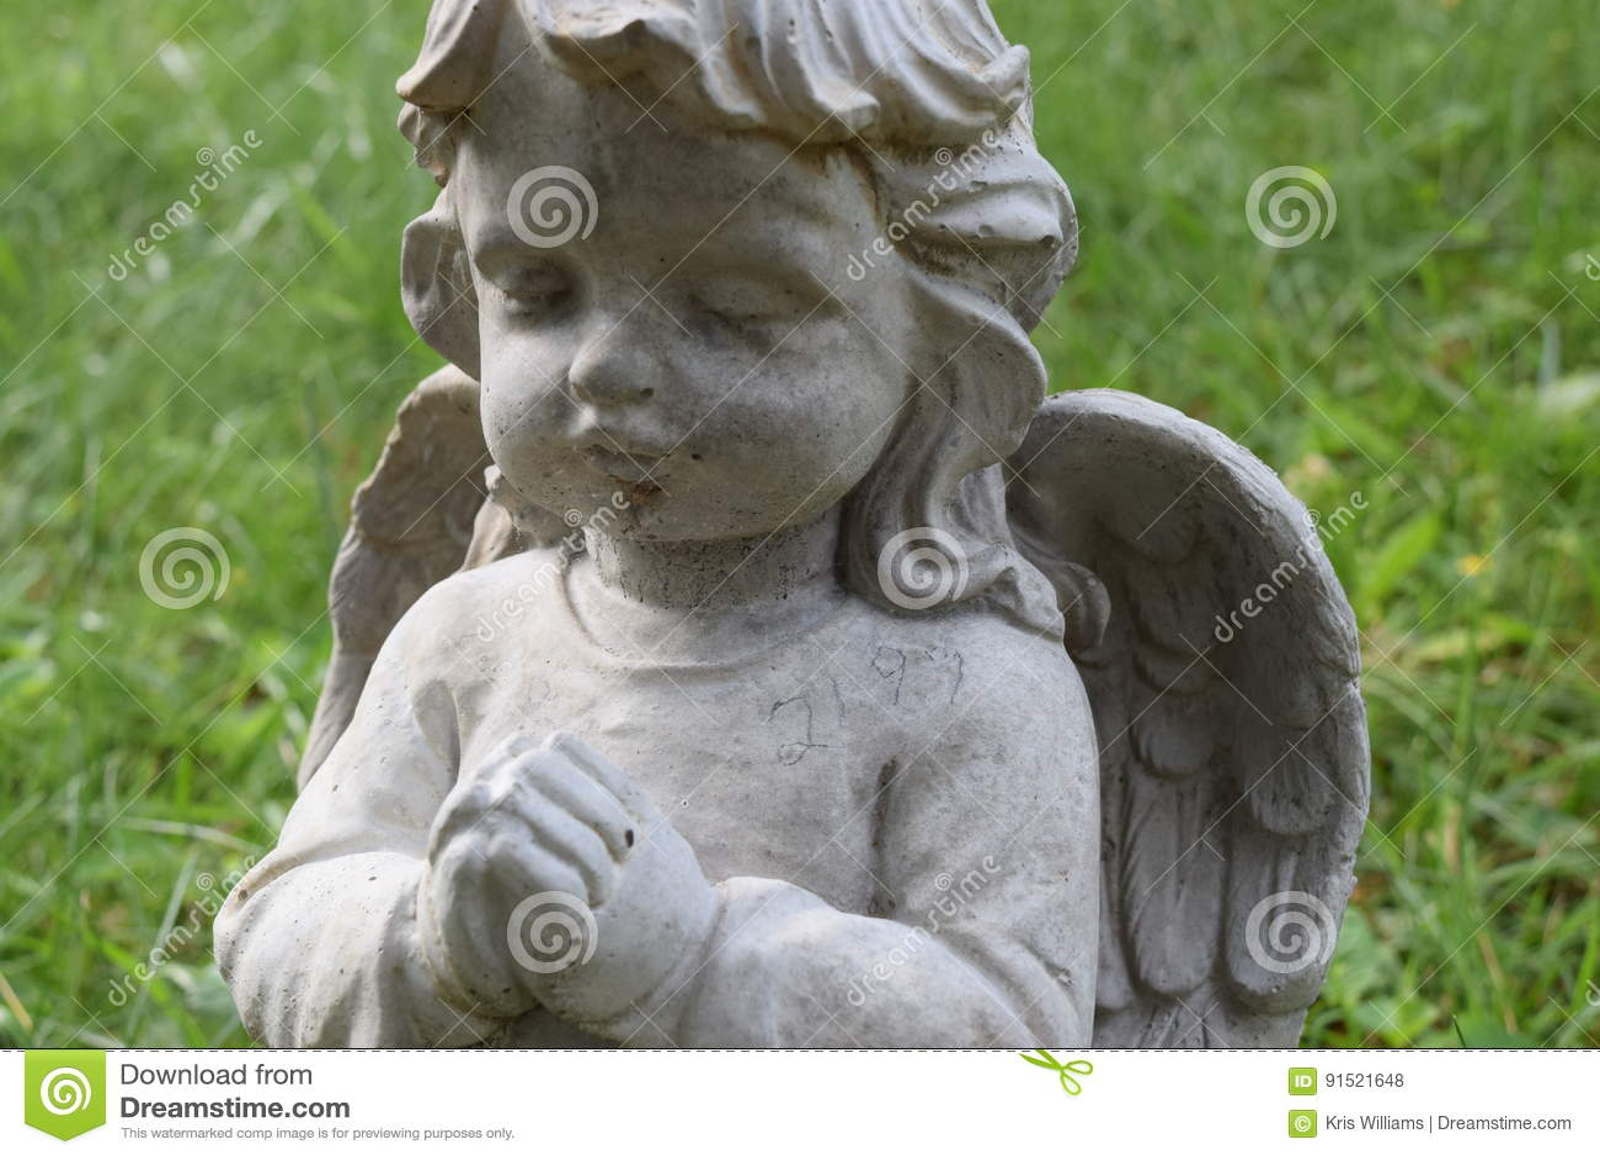 Little child Angel praying